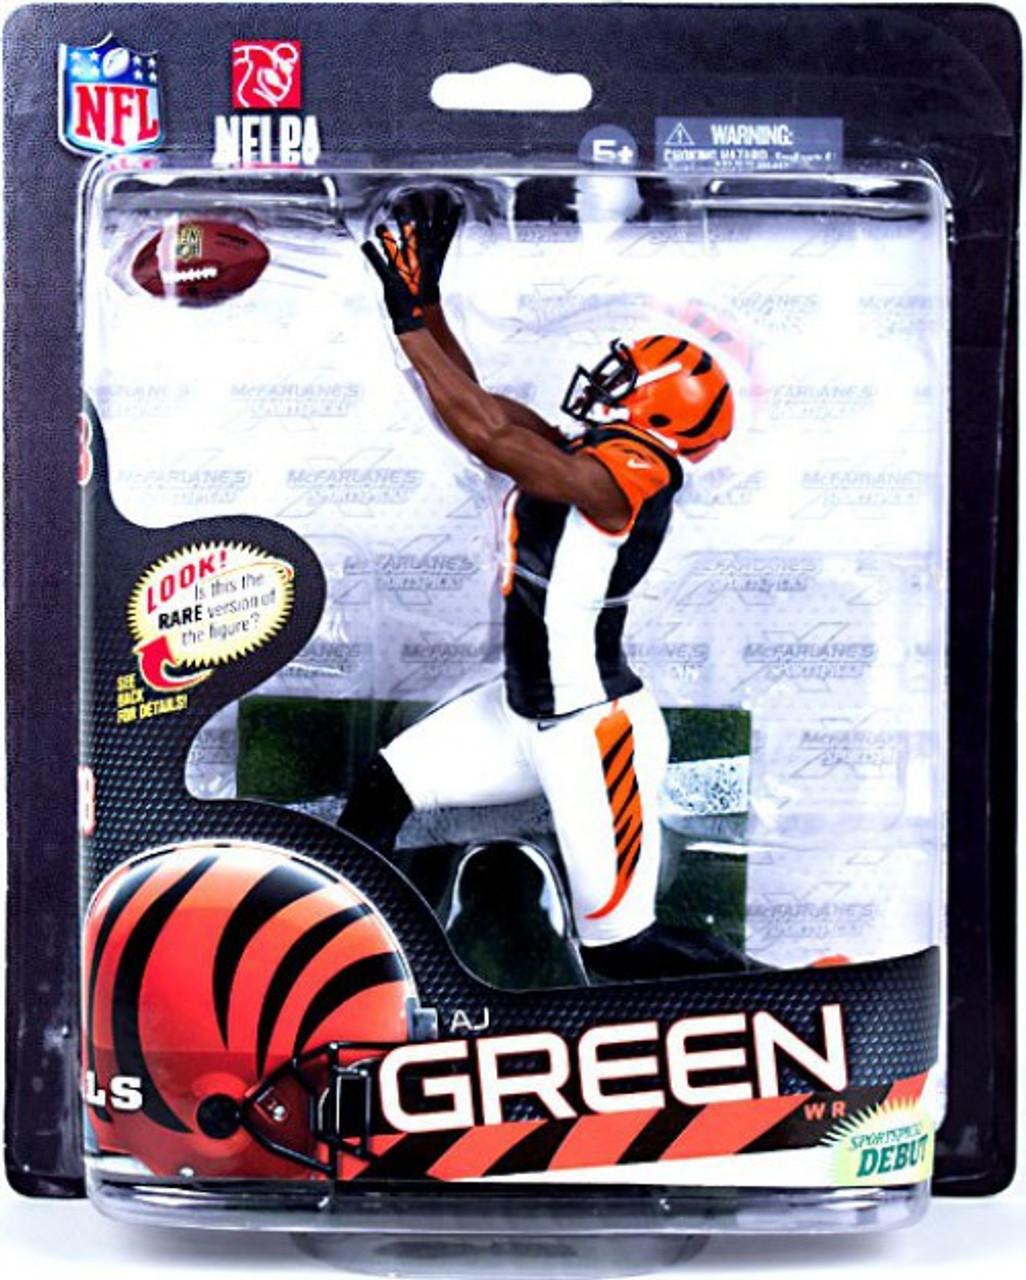 d42e1bd6a McFarlane Toys NFL Cincinnati Bengals Sports Picks Series 33 AJ Green  Action Figure Black Jersey - ToyWiz